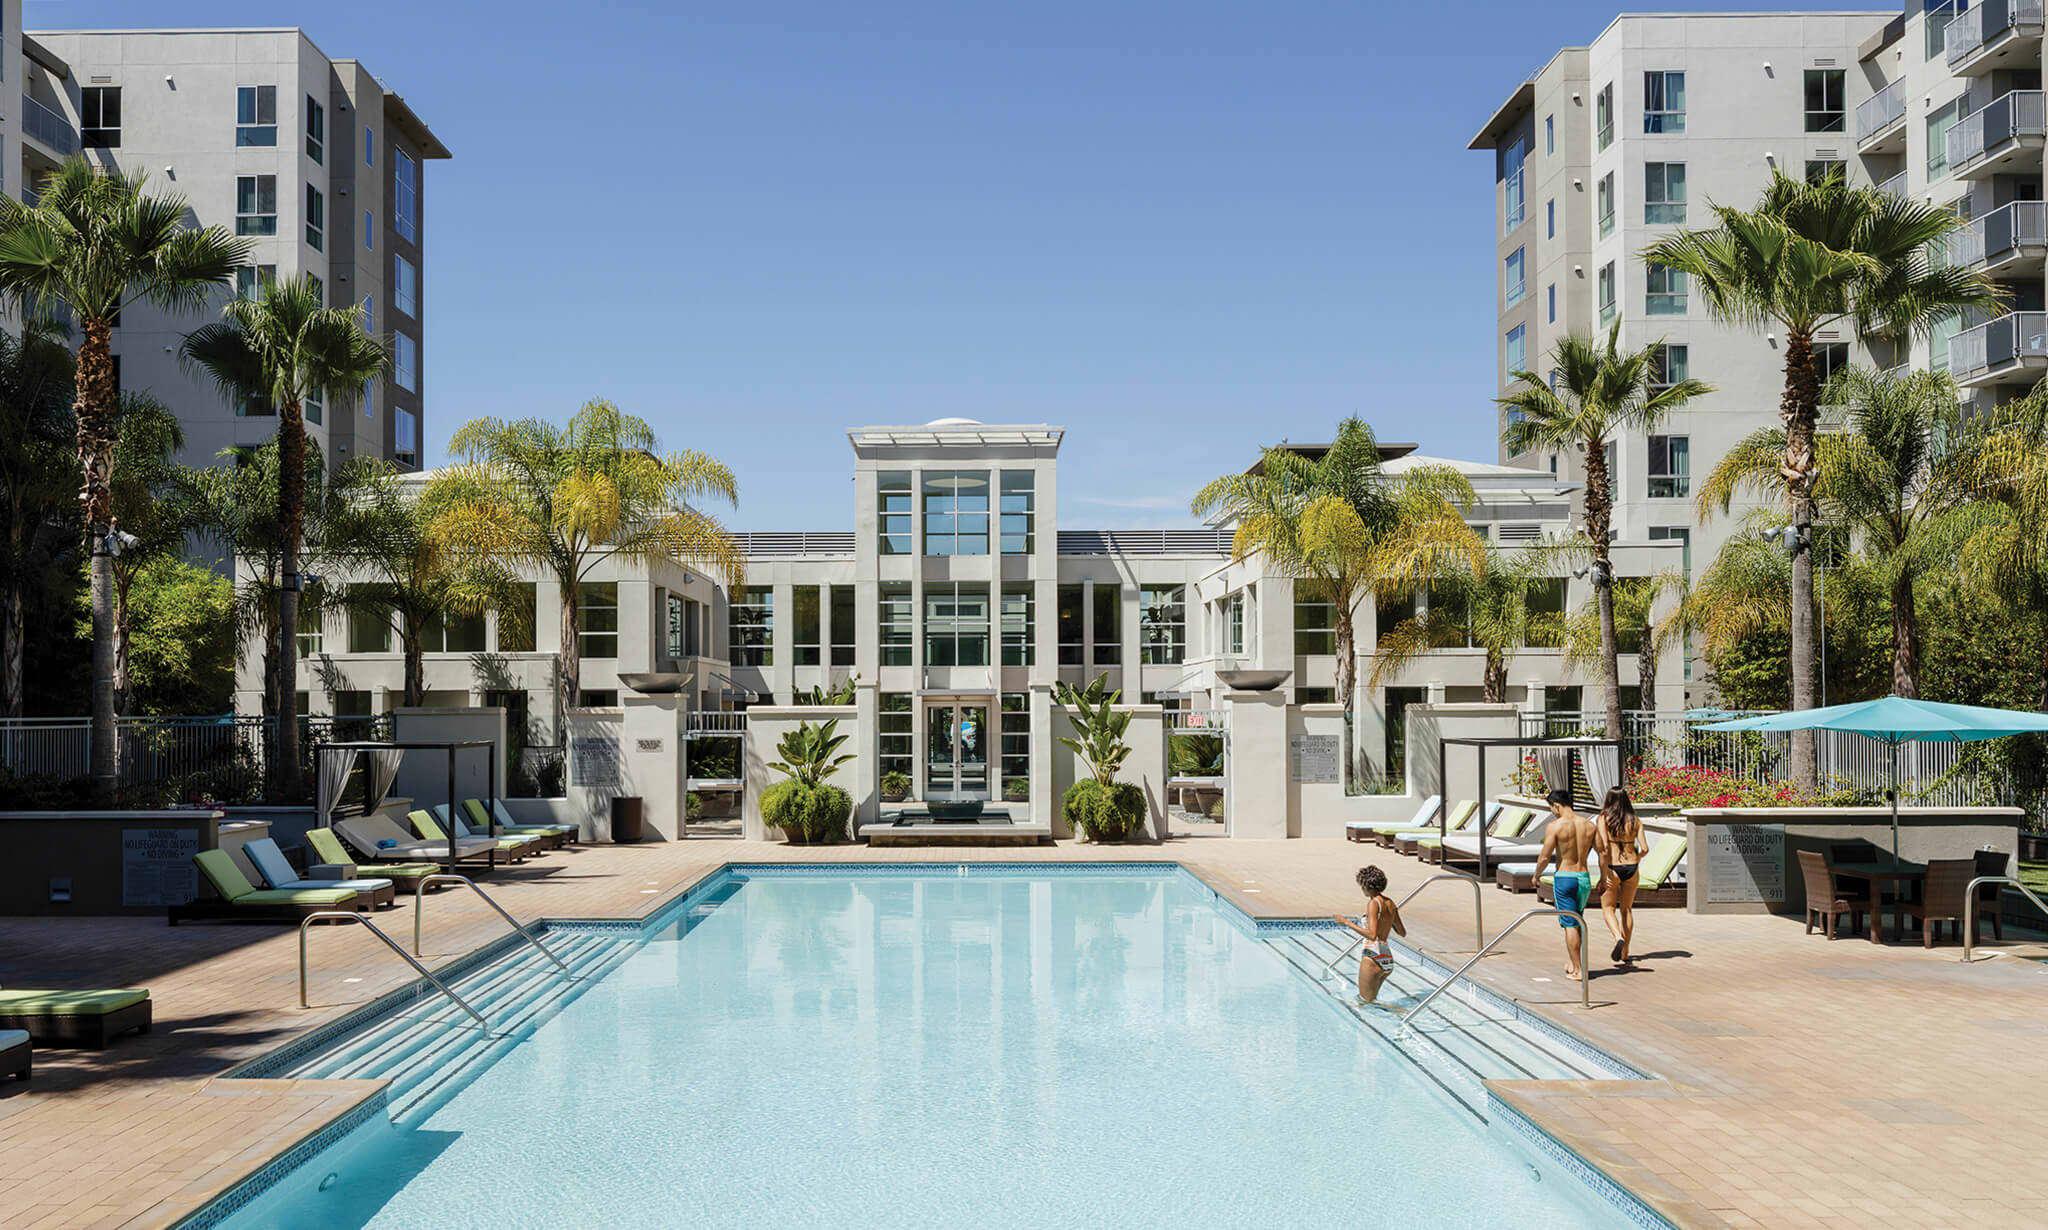 550 Moreland Apartments apartments in Santa Clara CA to rent photo 1